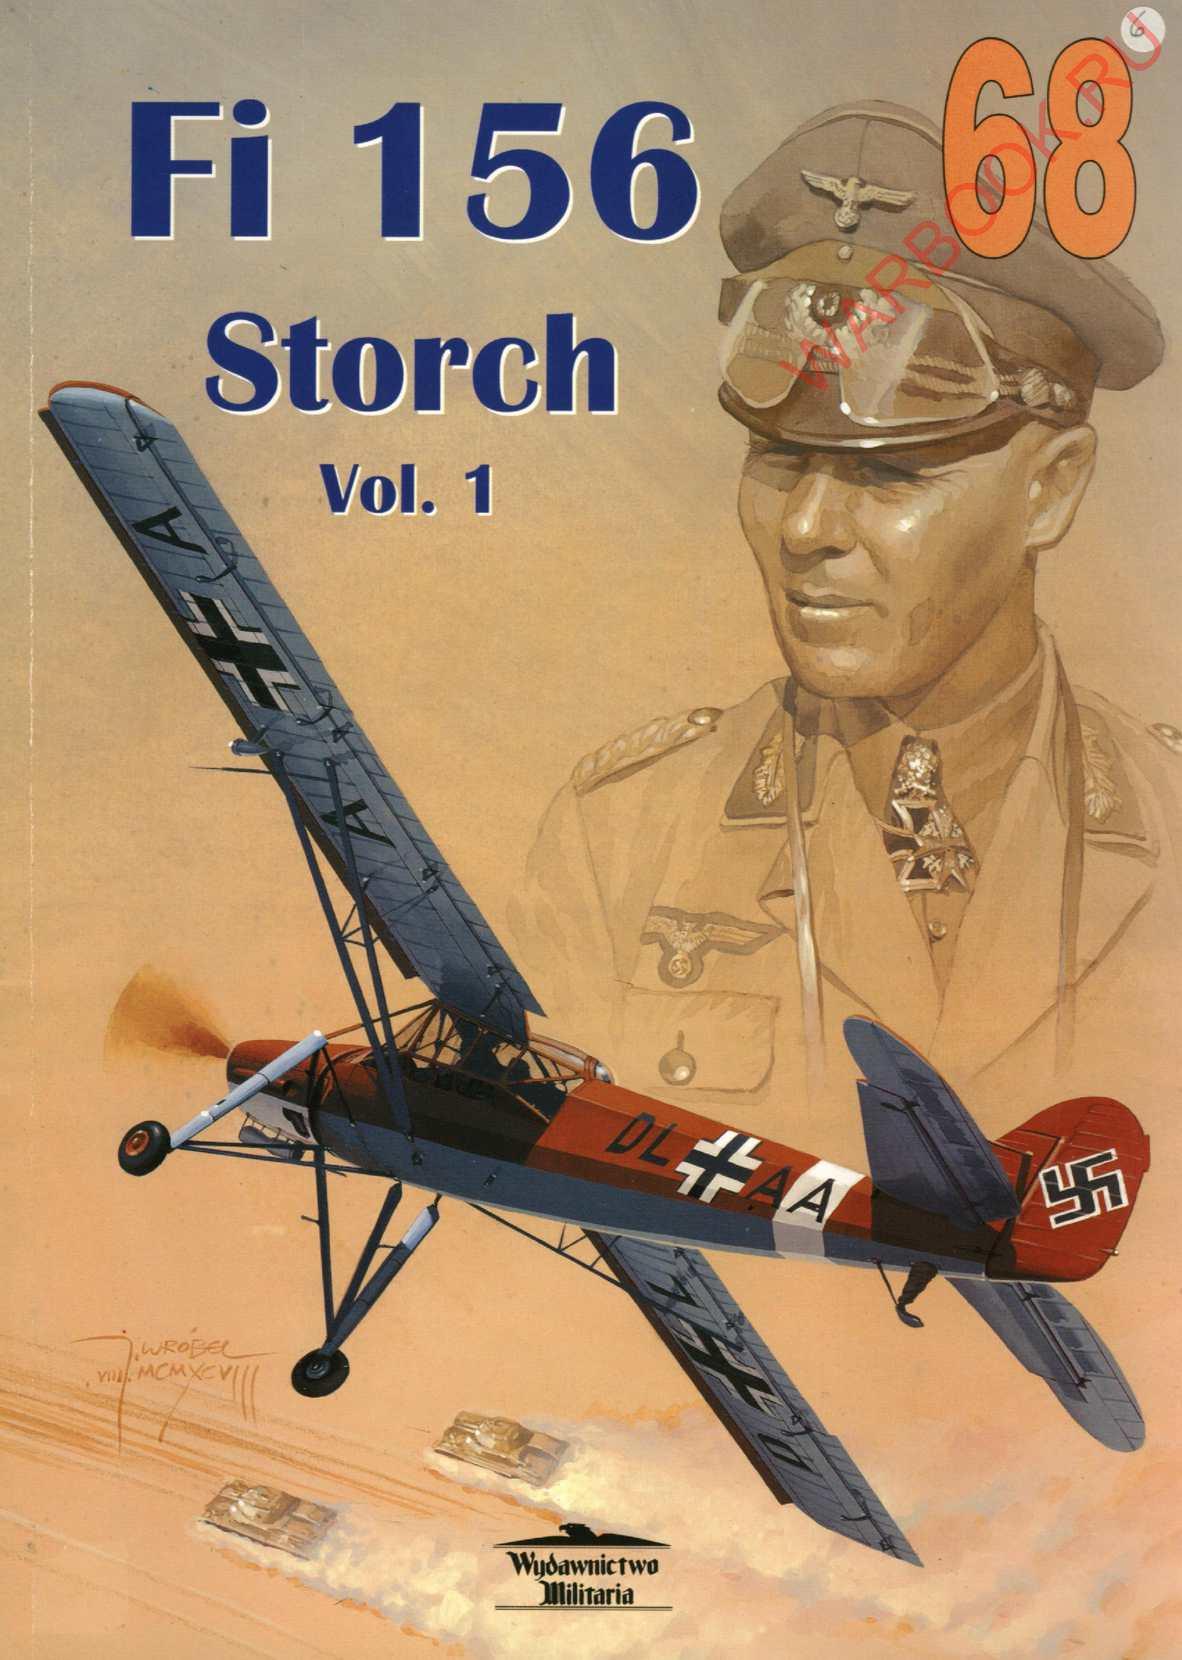 Wydawnictwo Militaria 68 Fieseler Fi-156 Storch cz 1